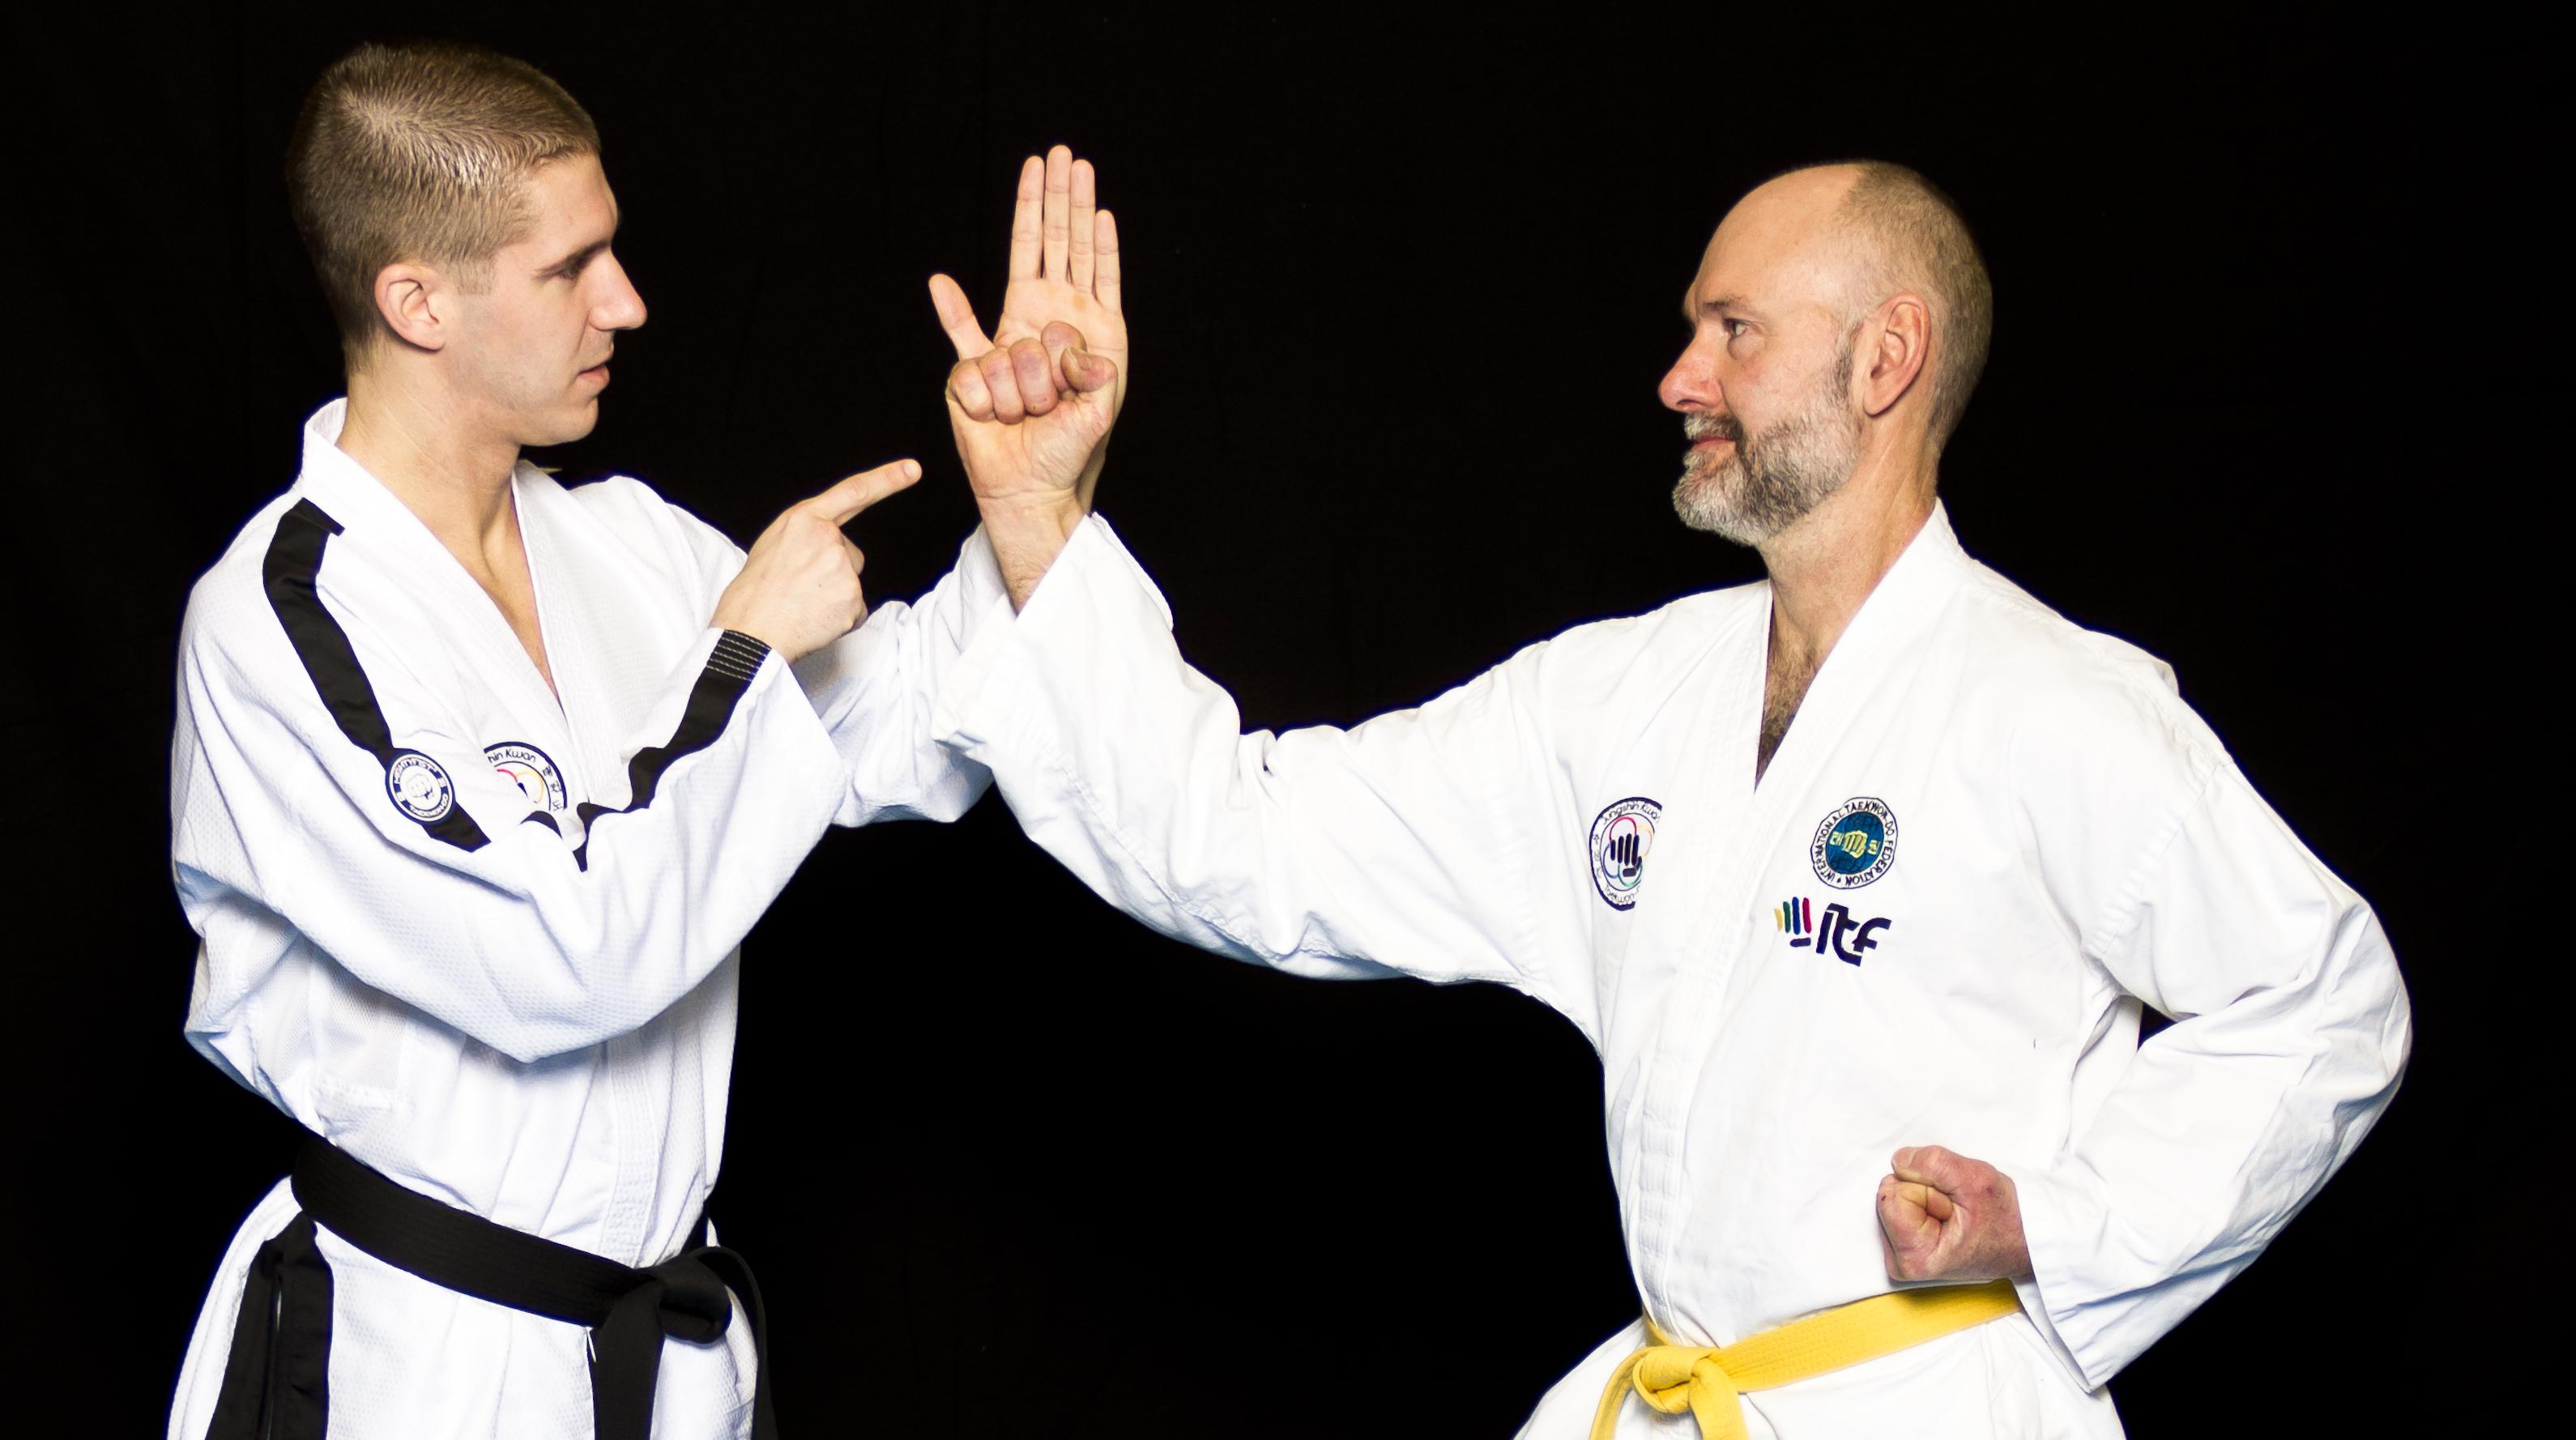 Personal Taekwon-Do Training